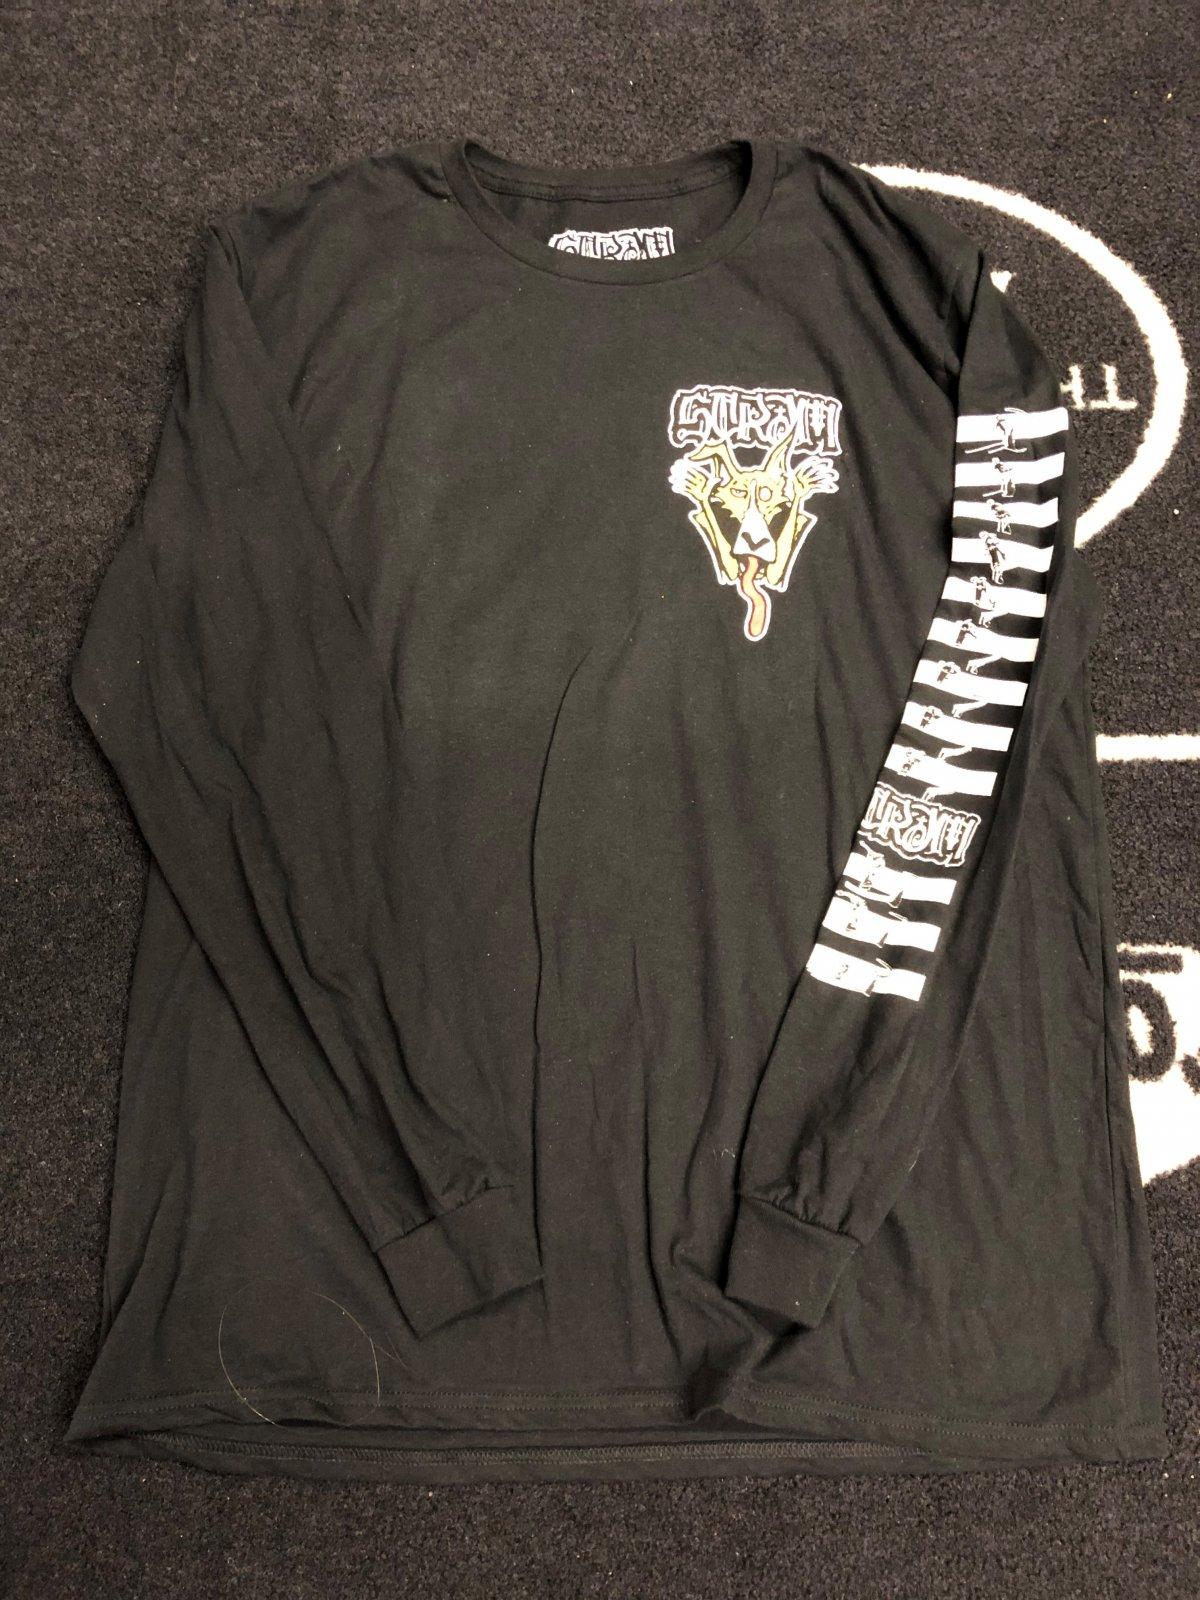 Scram Keenan l/s shirt Black